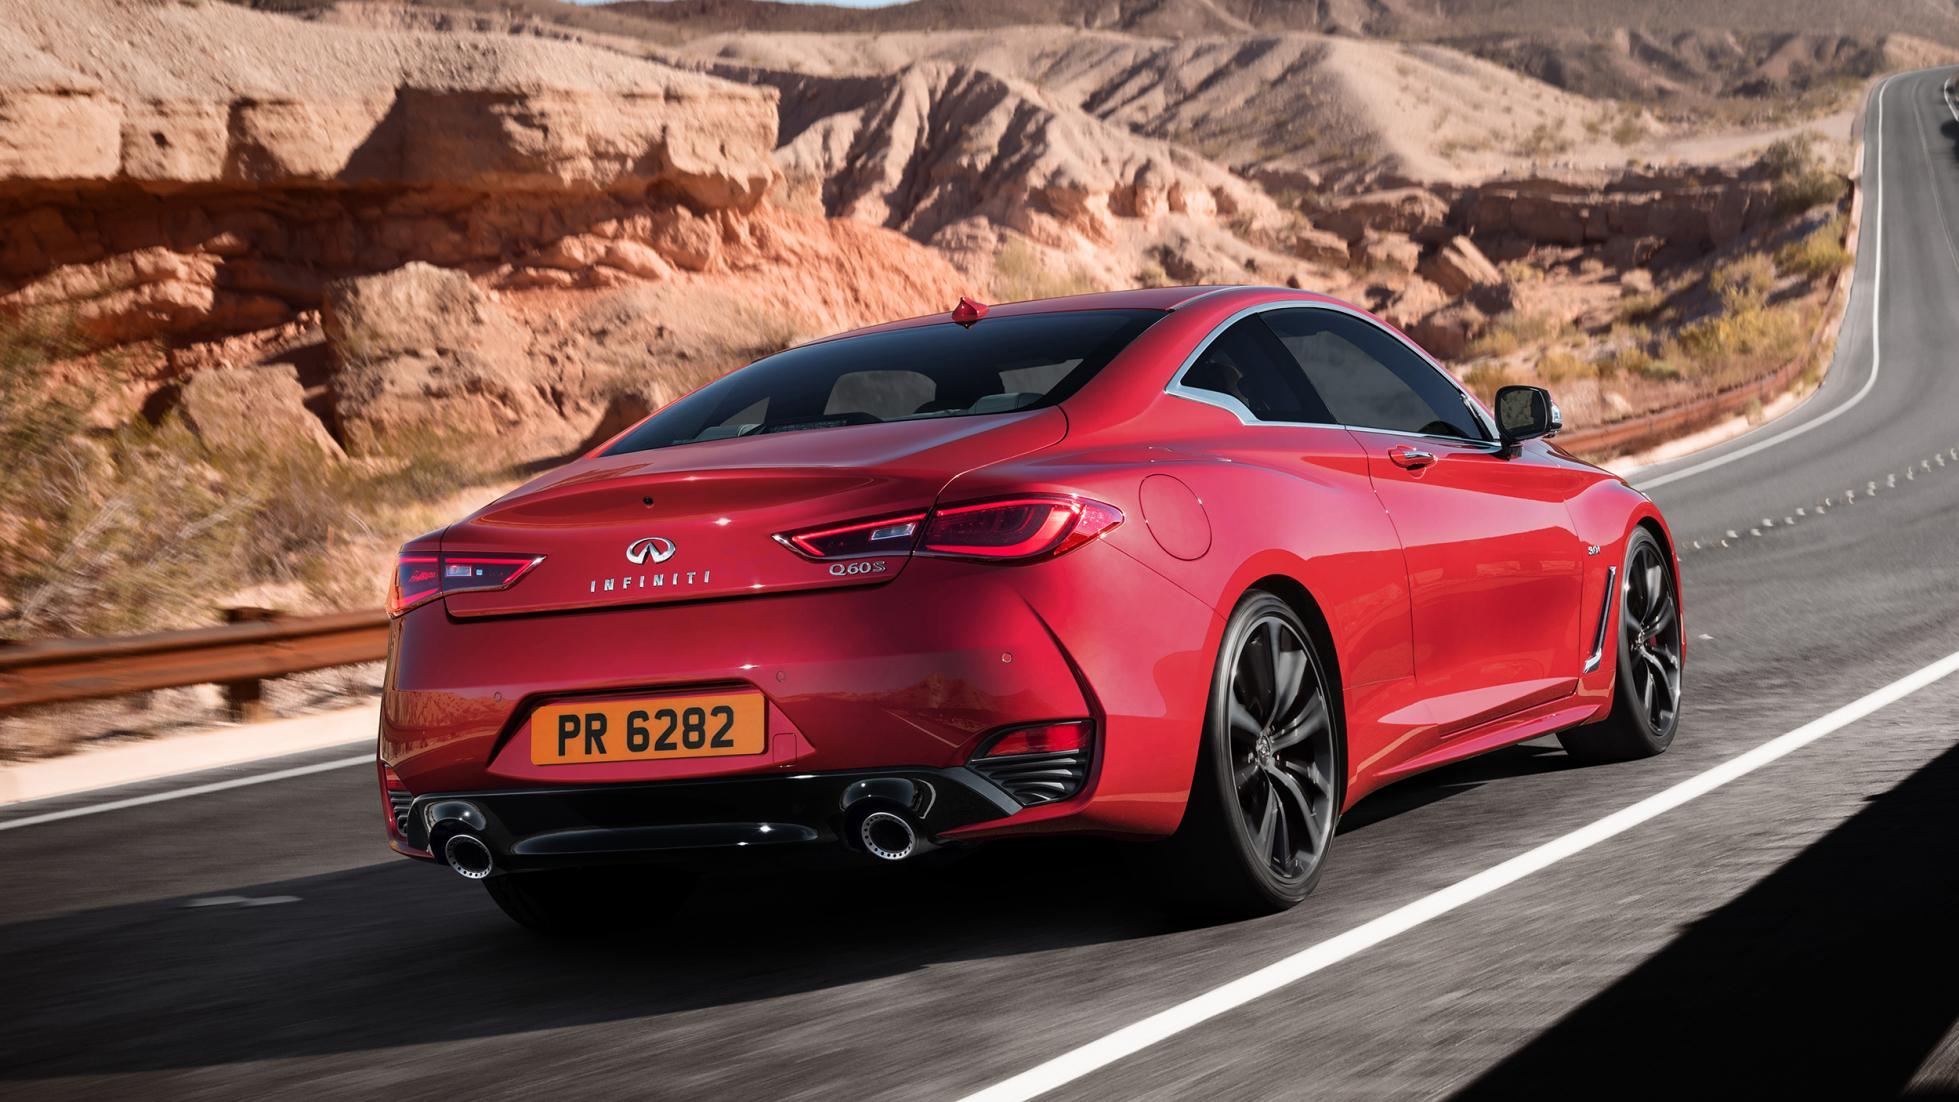 Анонсирован начало продаж купе Инфинити Q60 Coupe 2017 модельного года